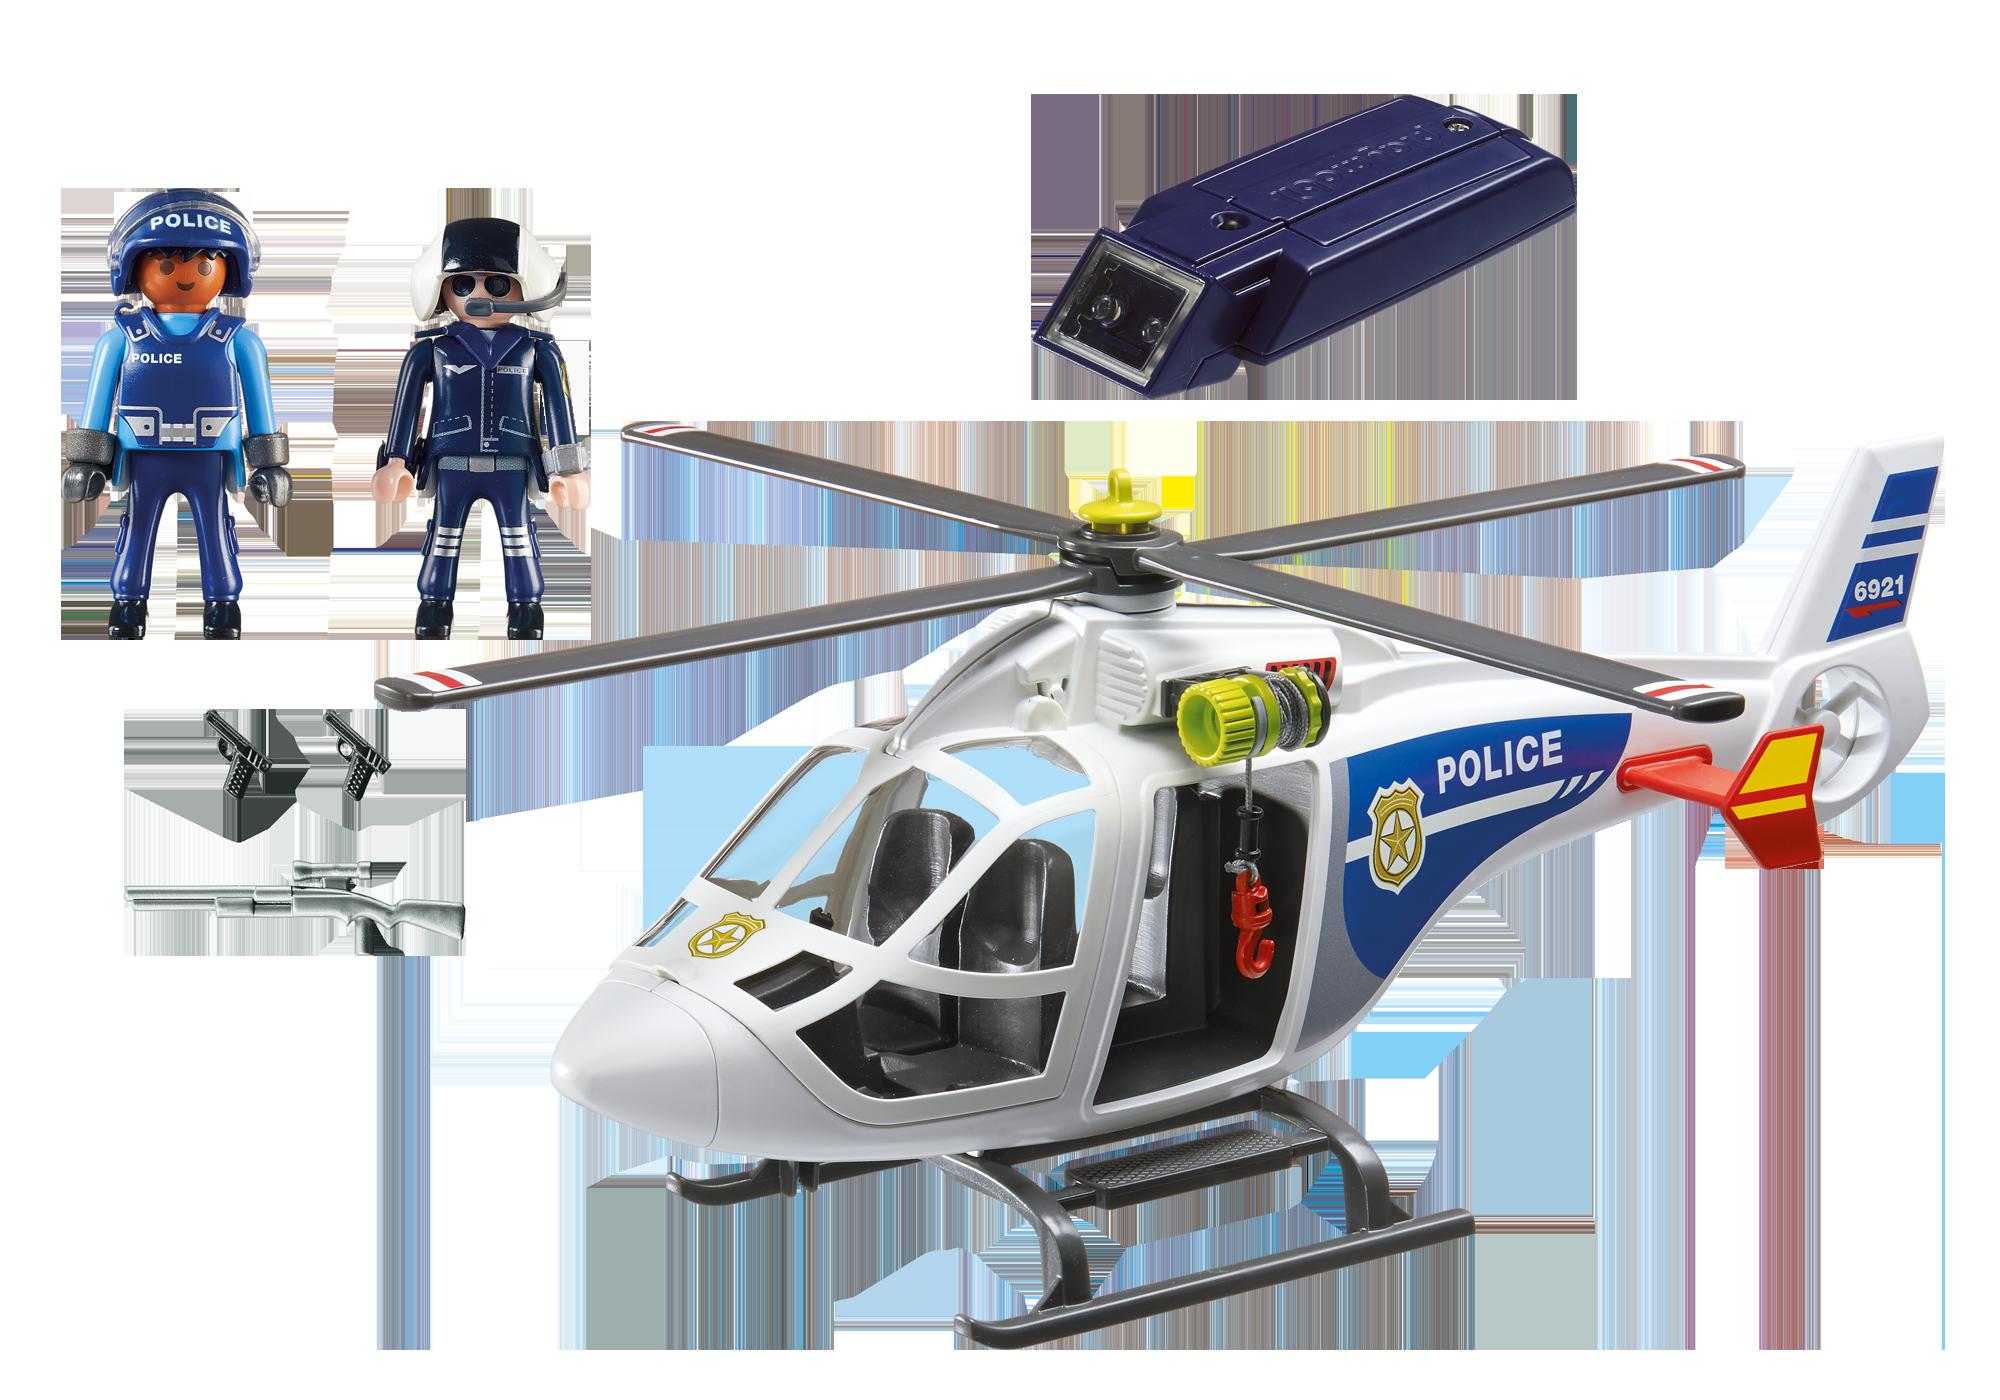 http://media.playmobil.com/i/playmobil/6921_product_box_back/Hélicoptère de police avec projecteur de recherche